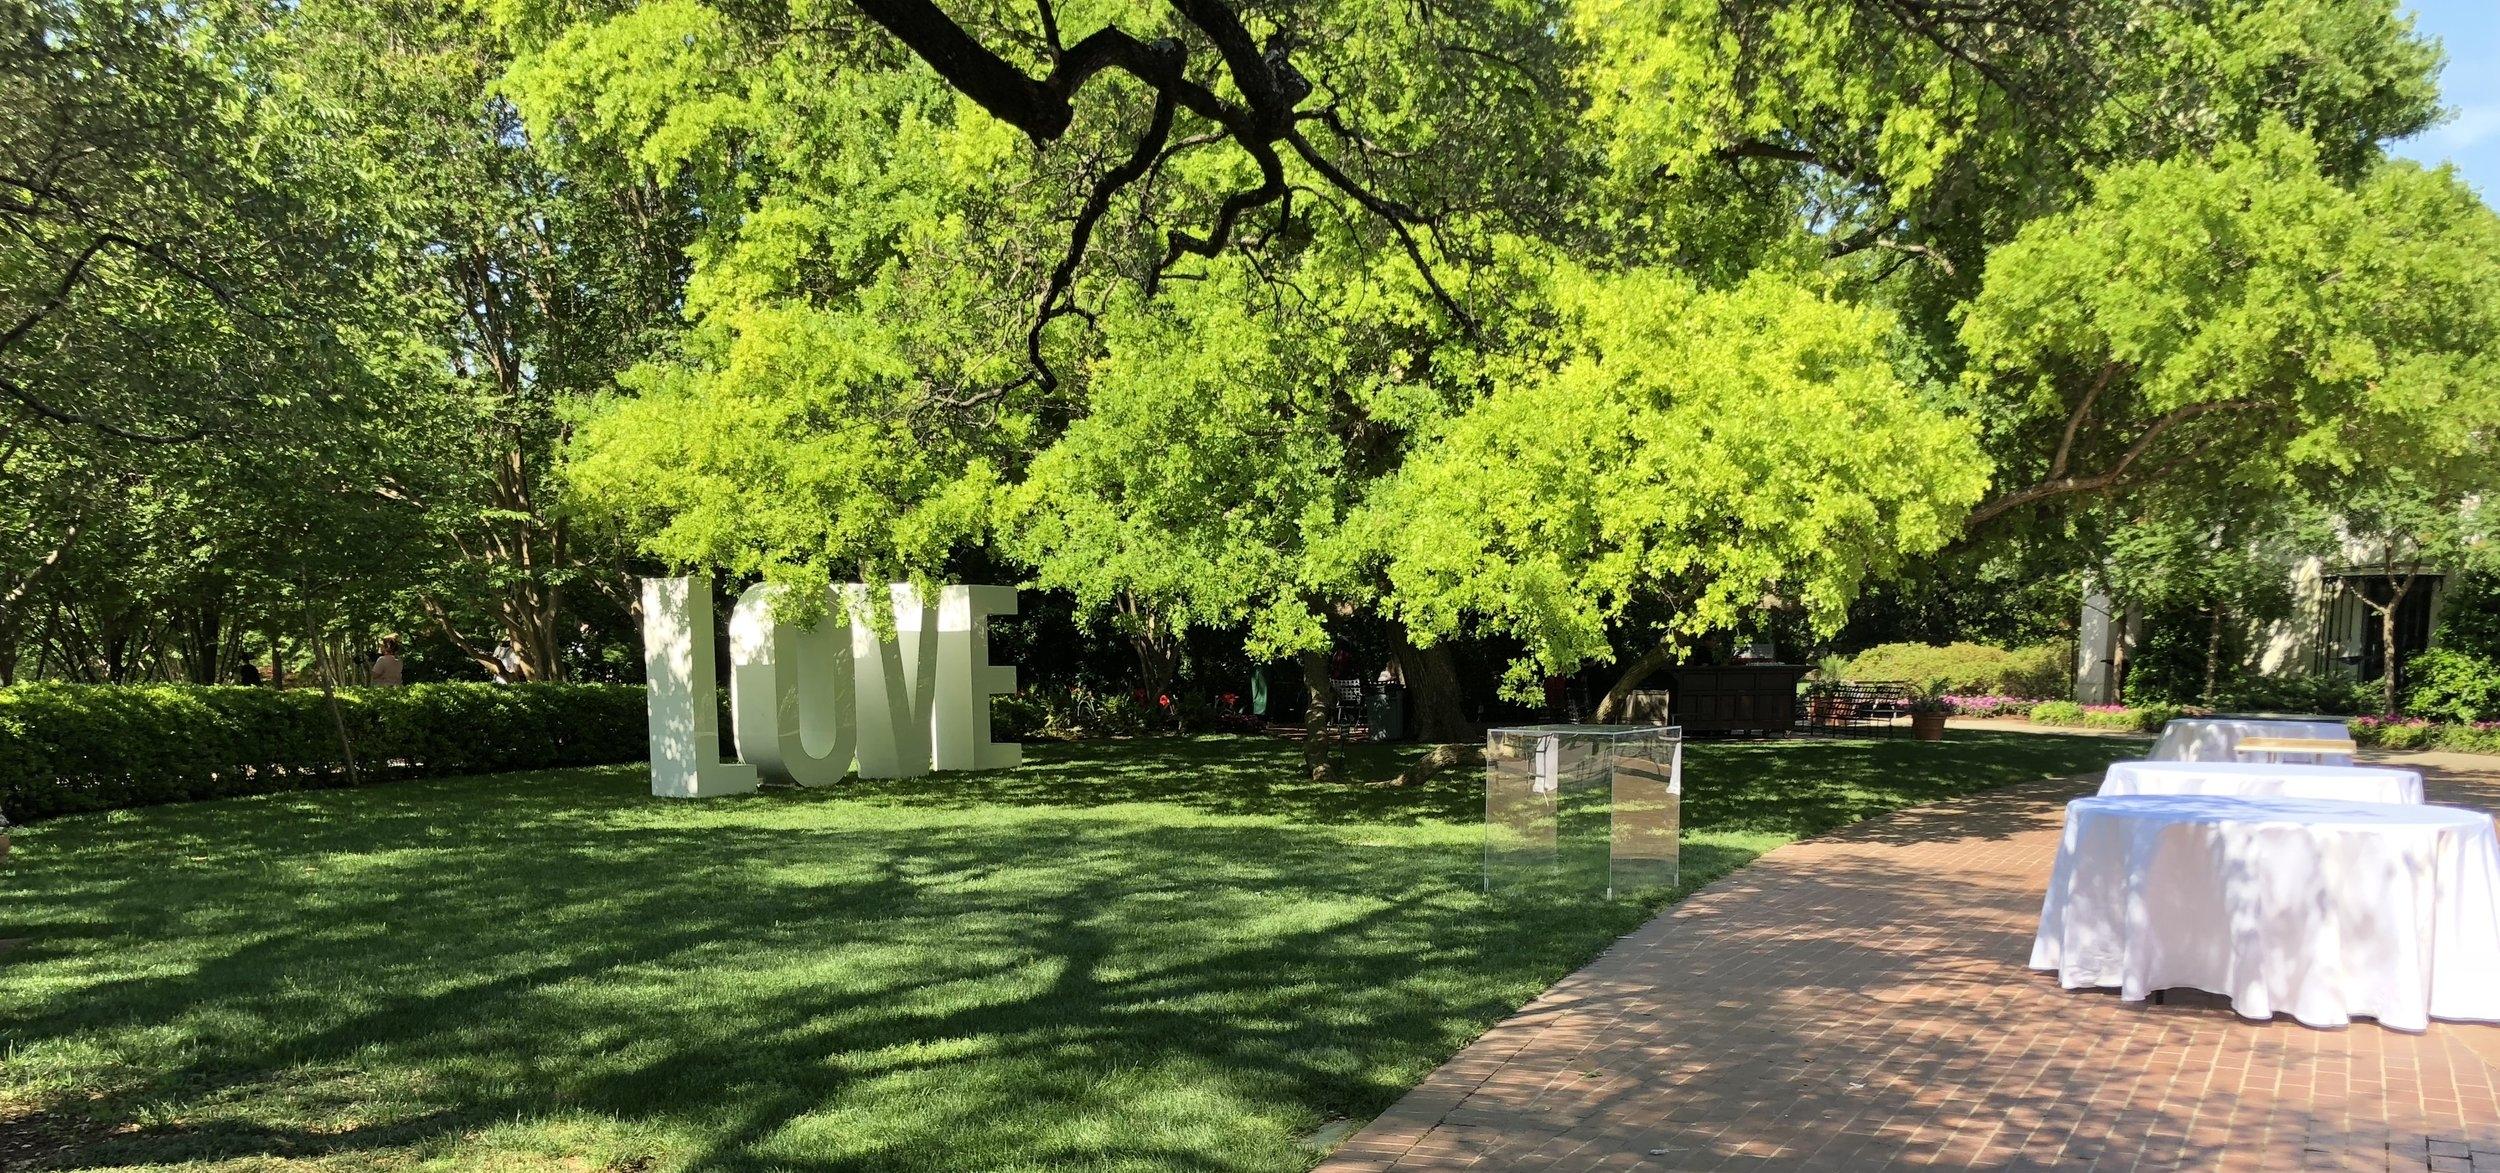 DeGoyler   Dallas Arboretum and Botanical Garden